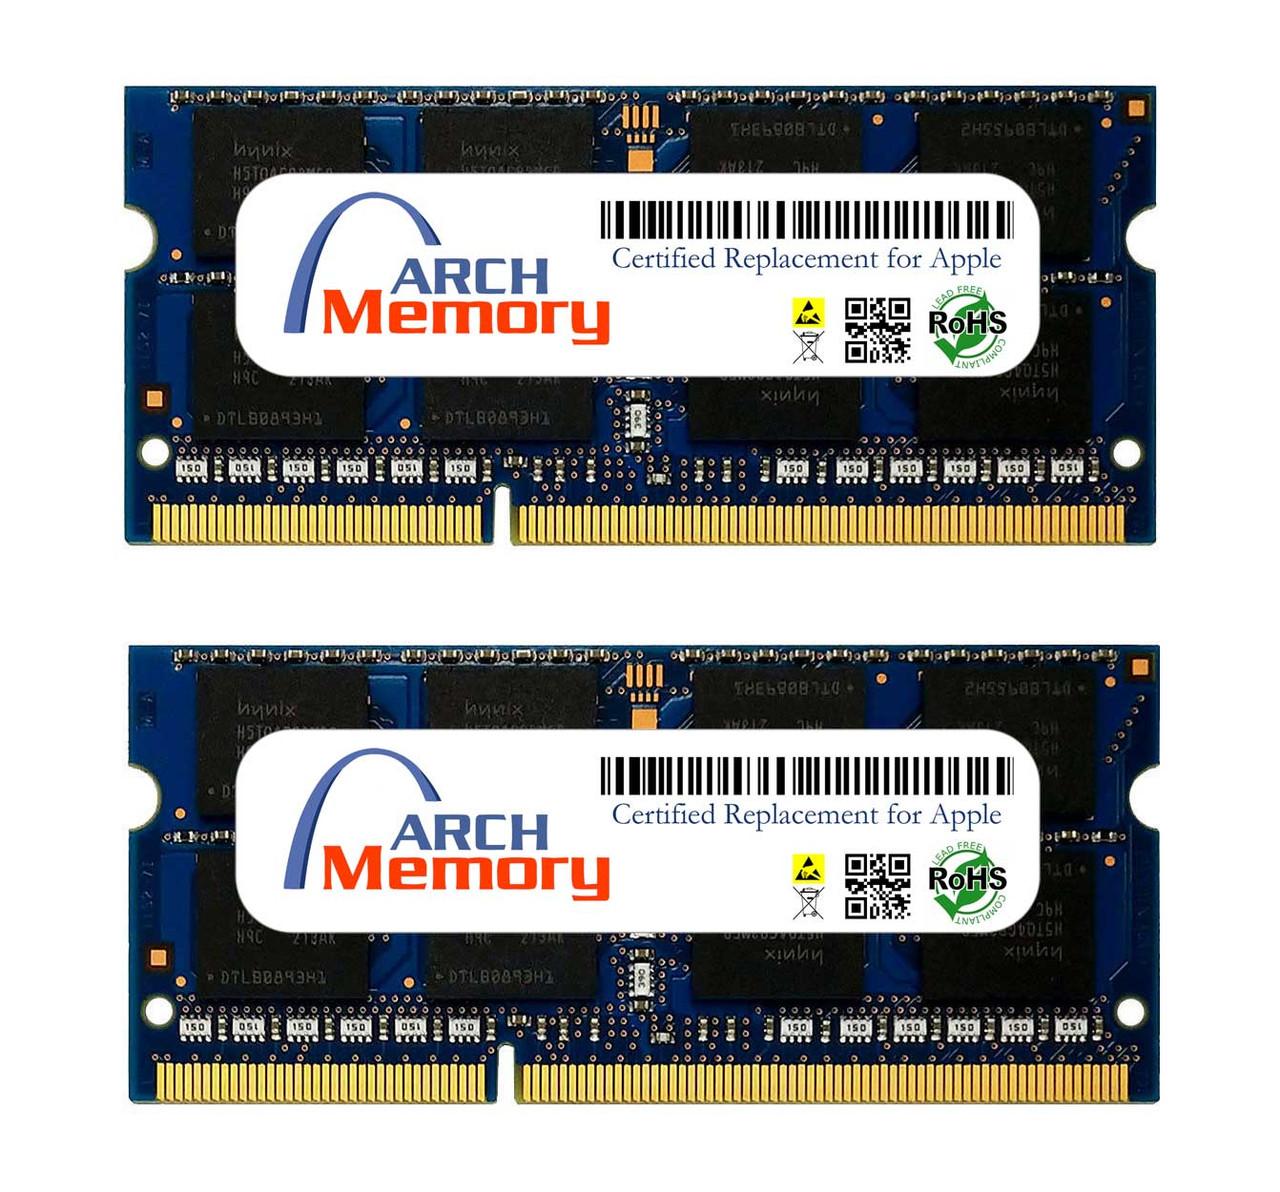 8GB MC016G/A (2 x 4GB) 204-Pin DDR3 So-dimm   Memory for Apple